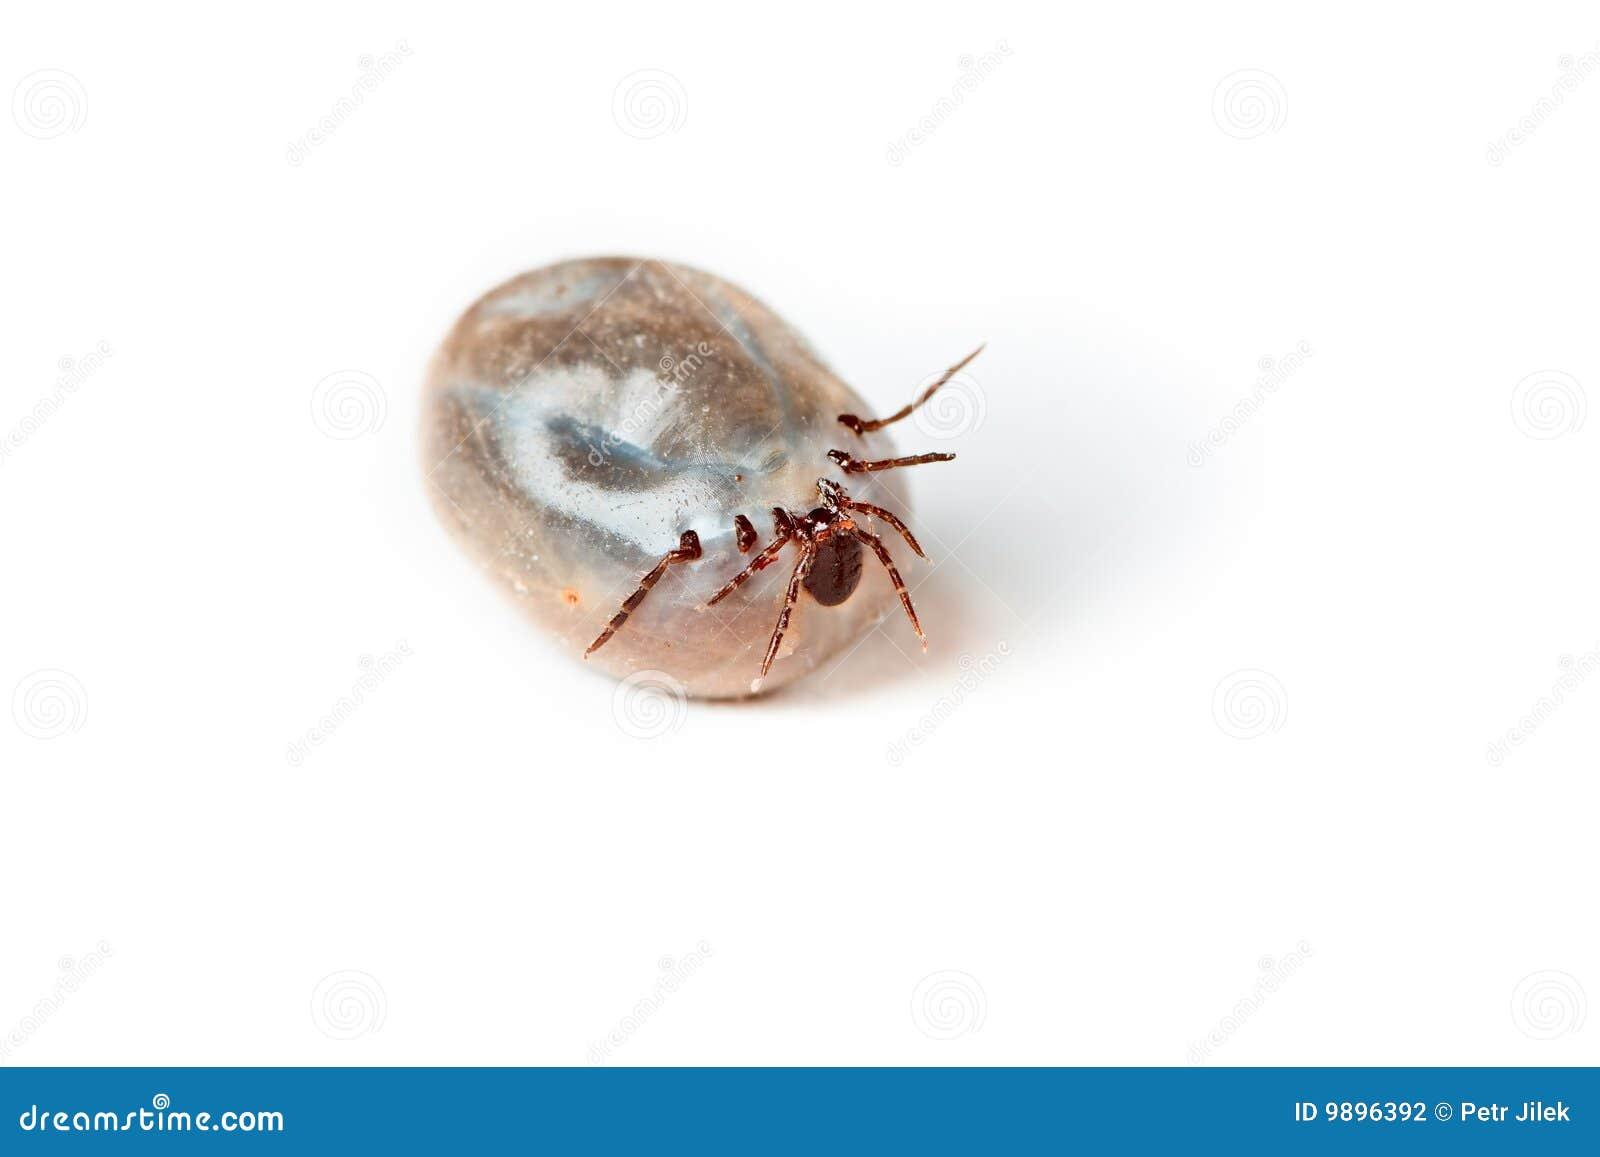 Tick - parasite on white background